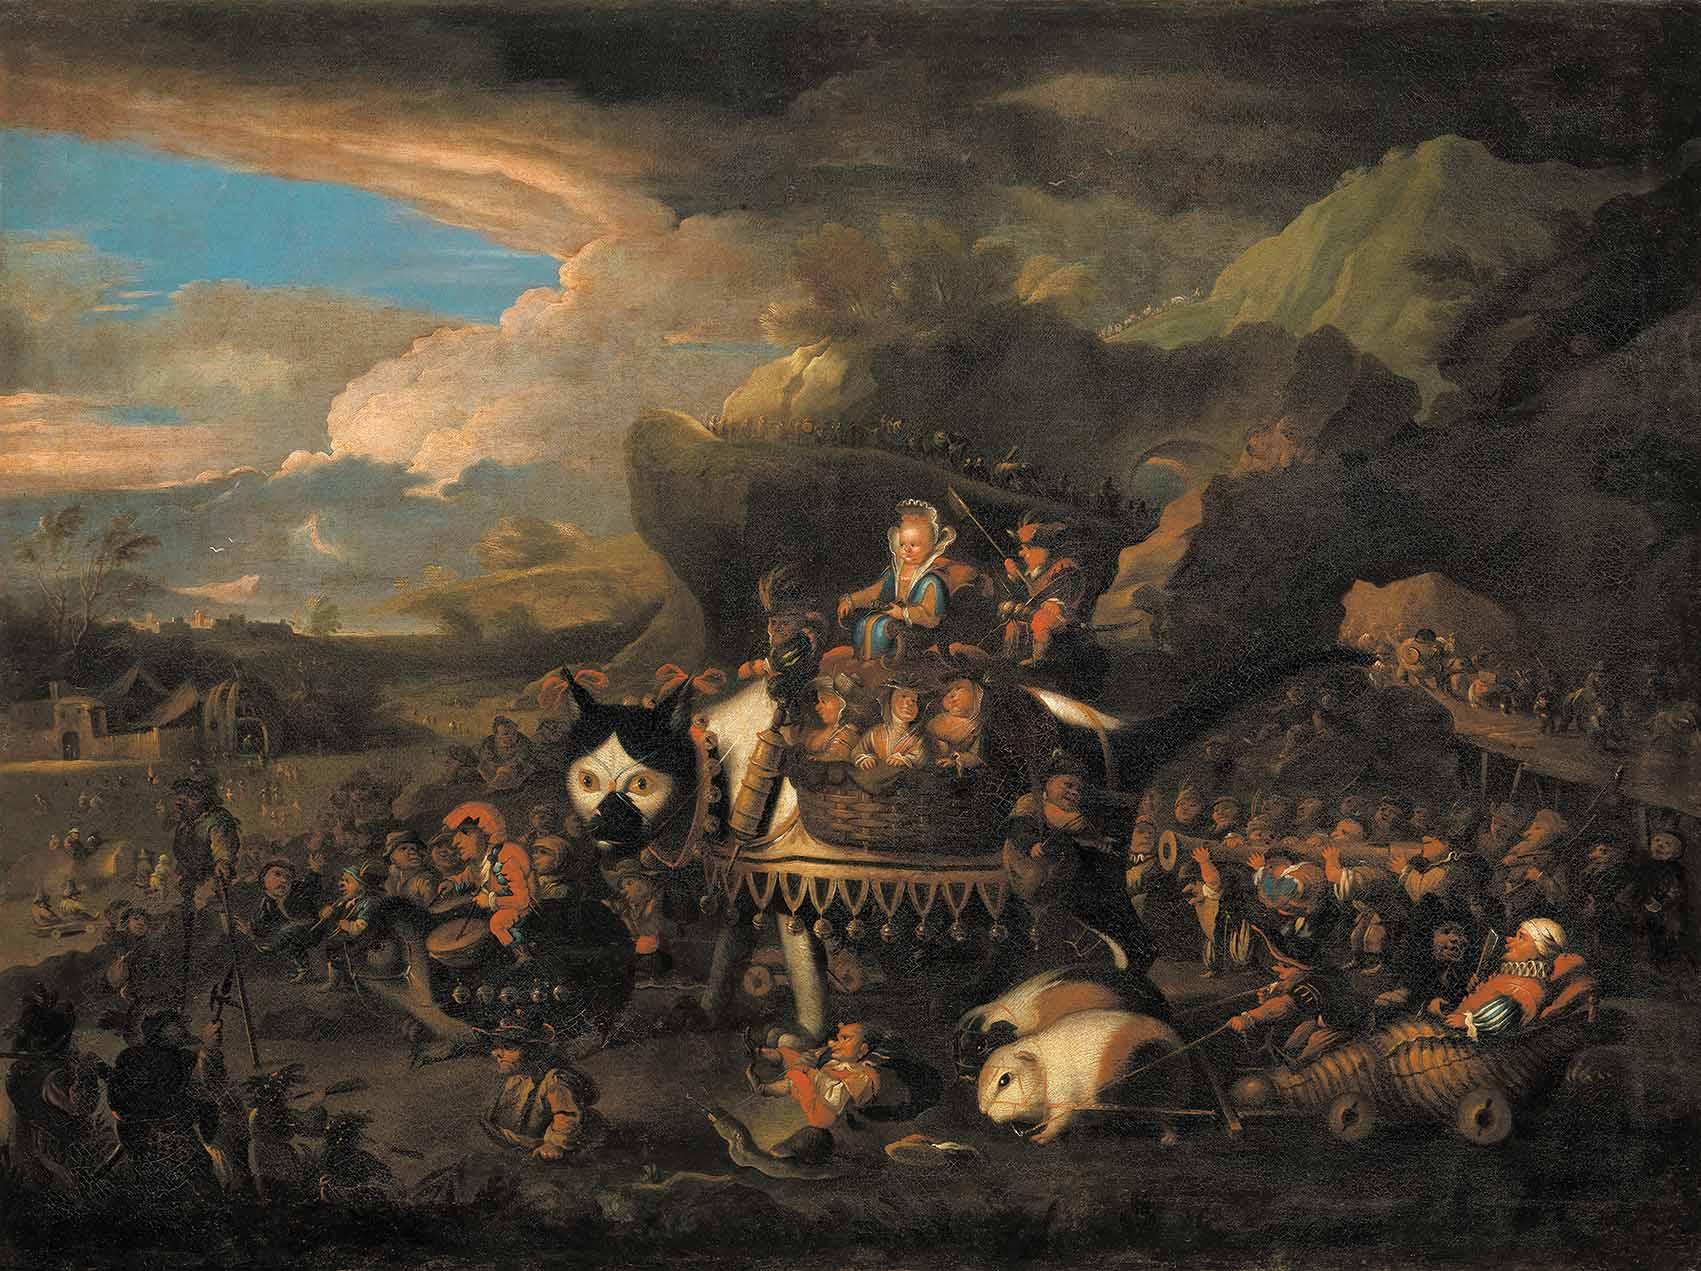 """El carro de oro"" de Johann Paul Schor Artes & contextos Fig. 15"